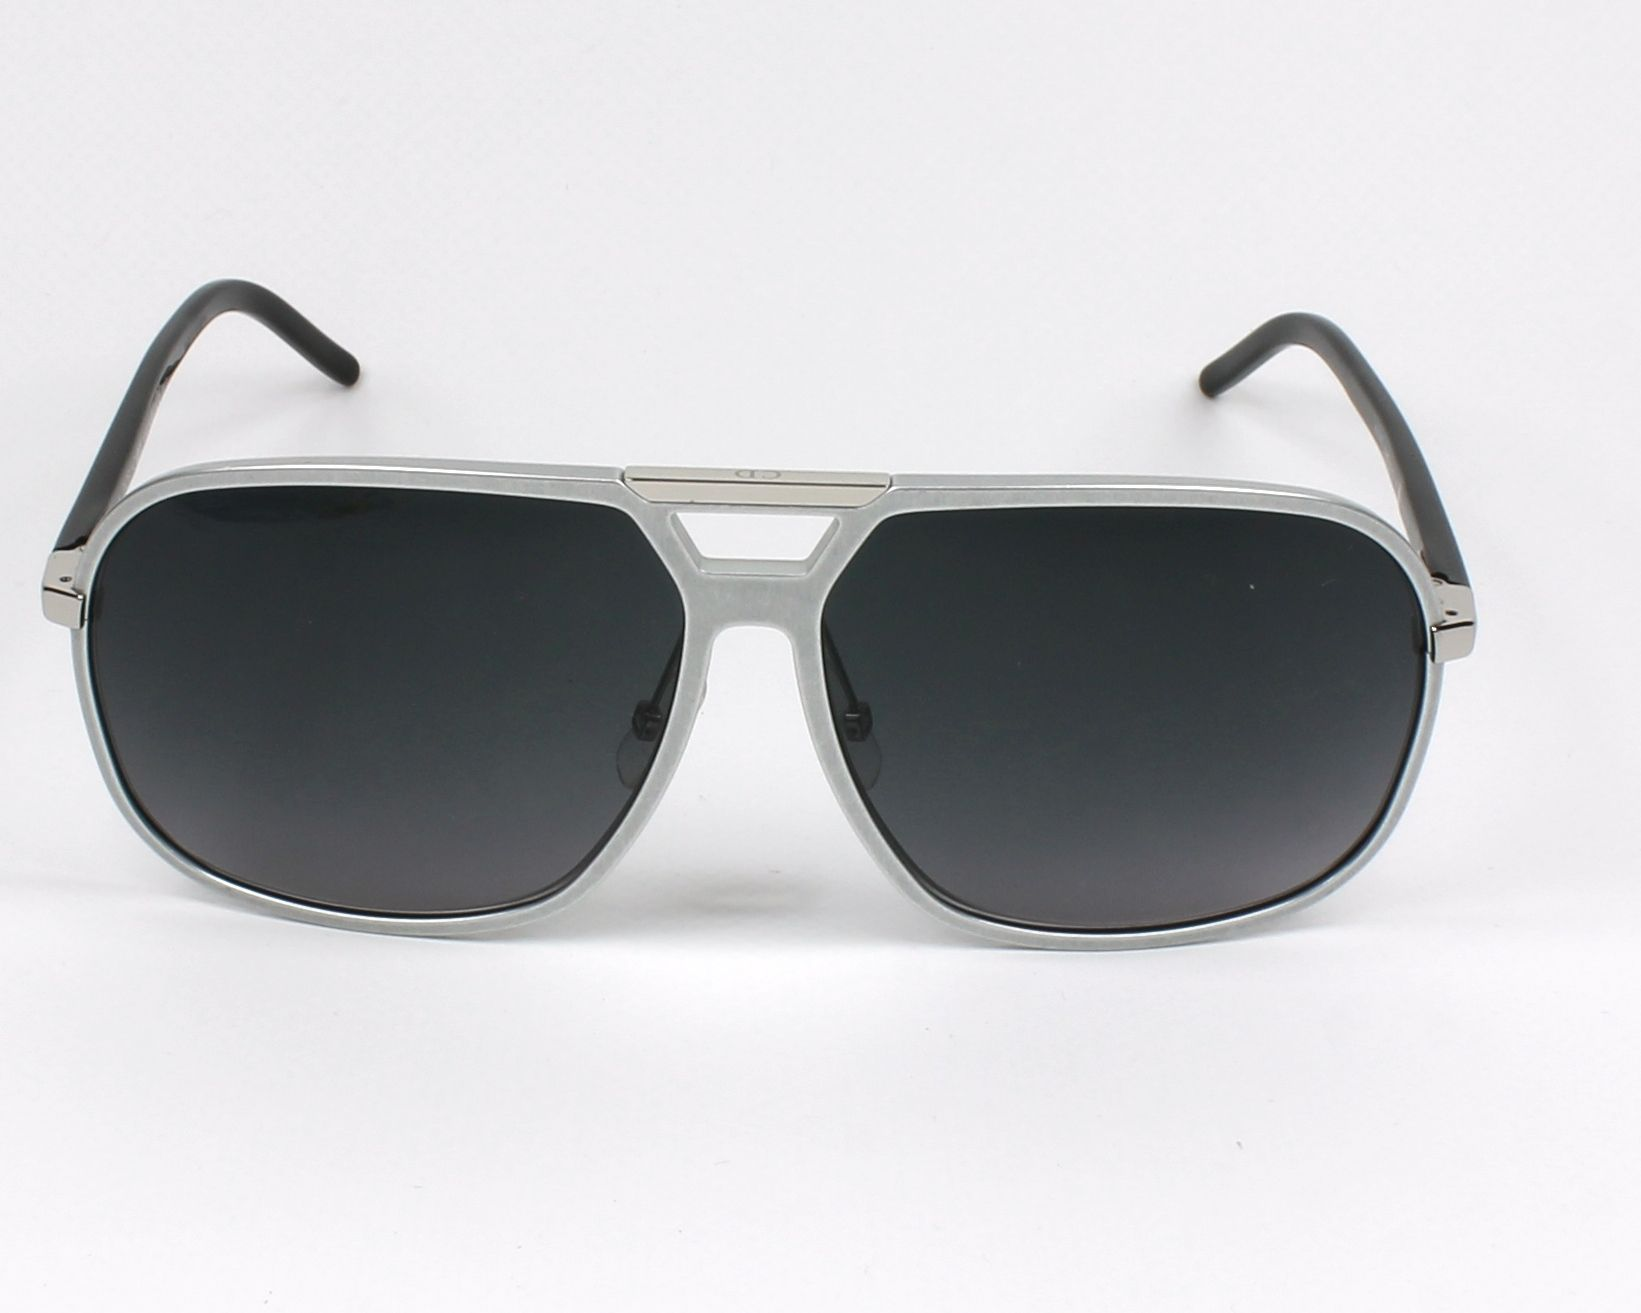 lunettes de soleil christian dior al 13 4 fs 53j argent avec des verres gris bleu. Black Bedroom Furniture Sets. Home Design Ideas